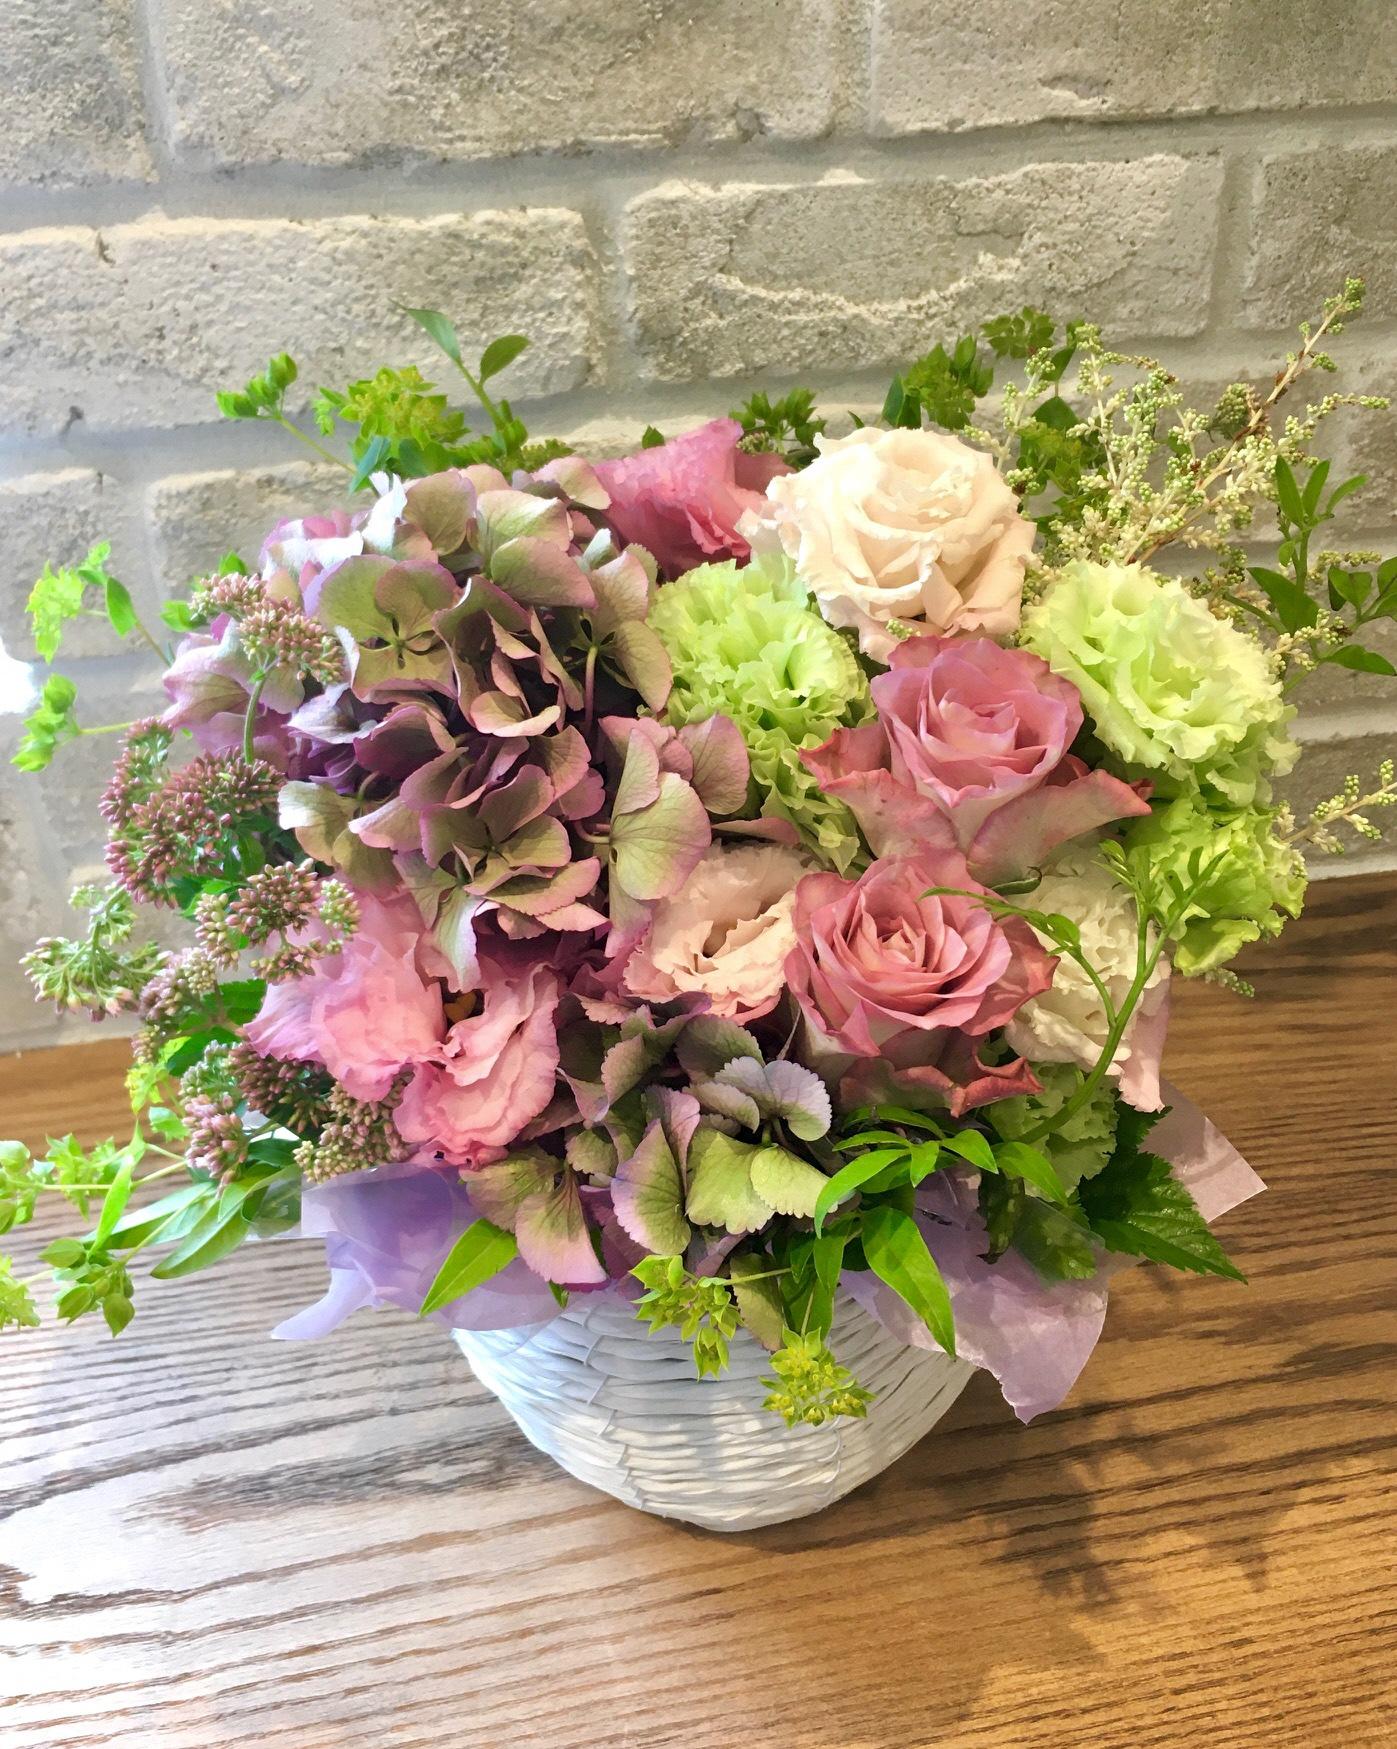 G10kashin季節の生花アレンジメント